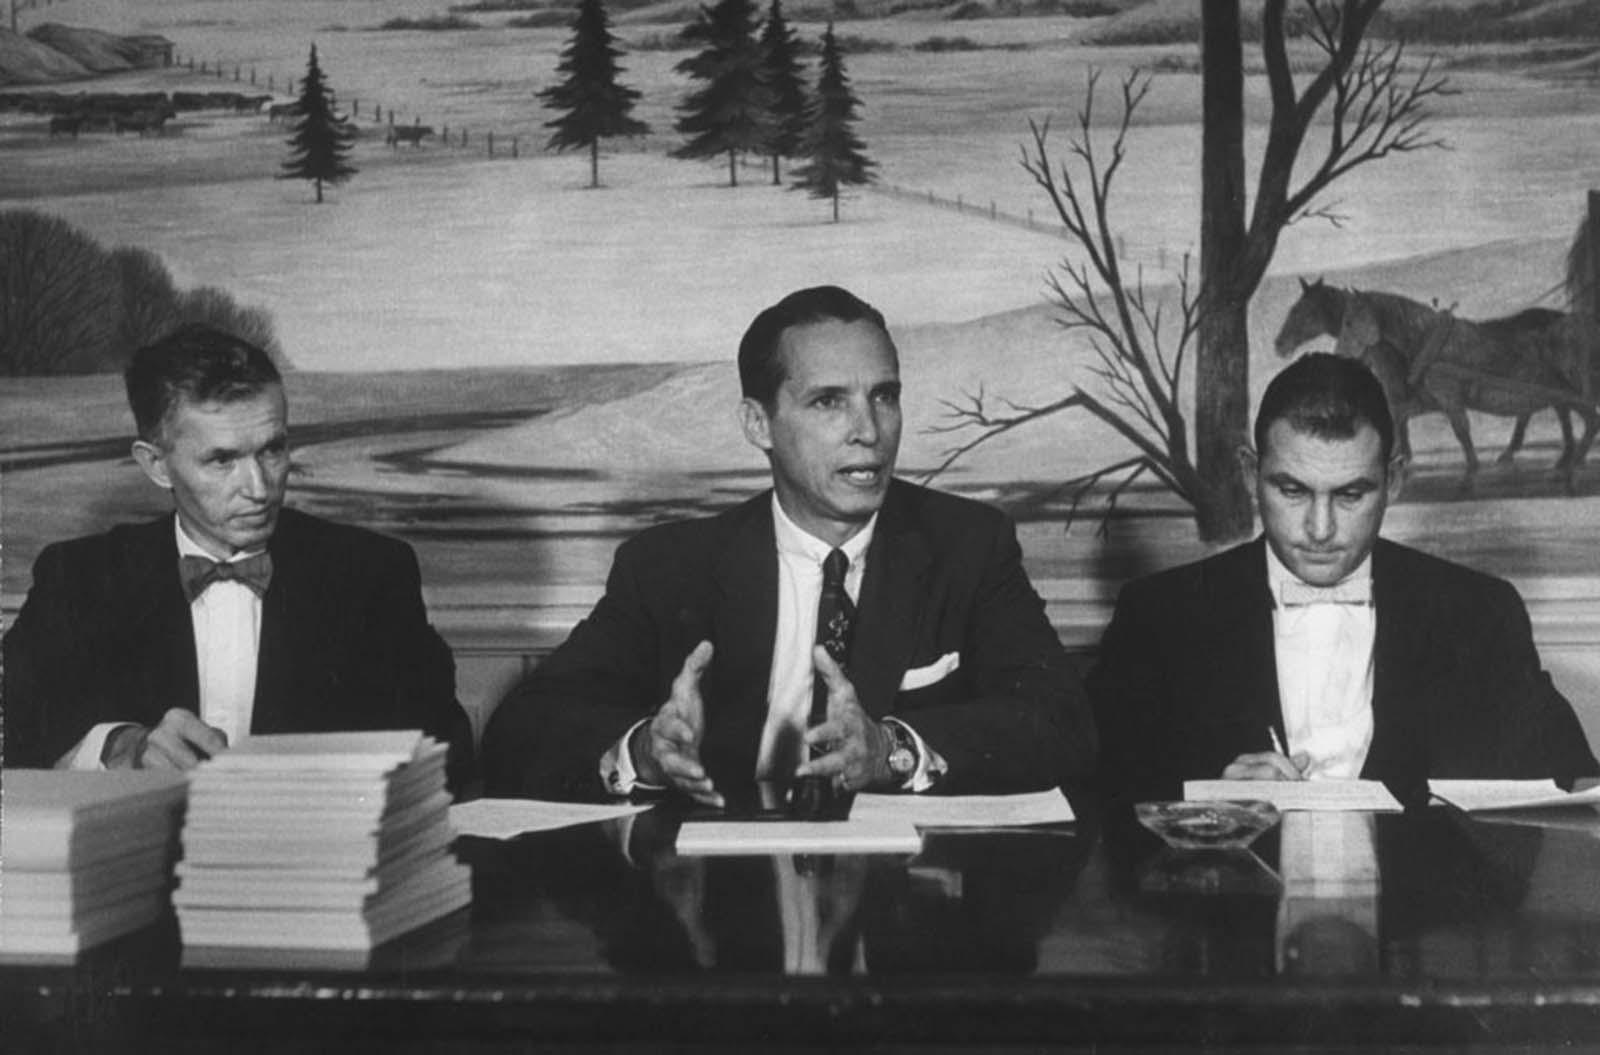 Surgeon General Dr. Leroy E. Burney (center) spoke during the influenza epidemic.